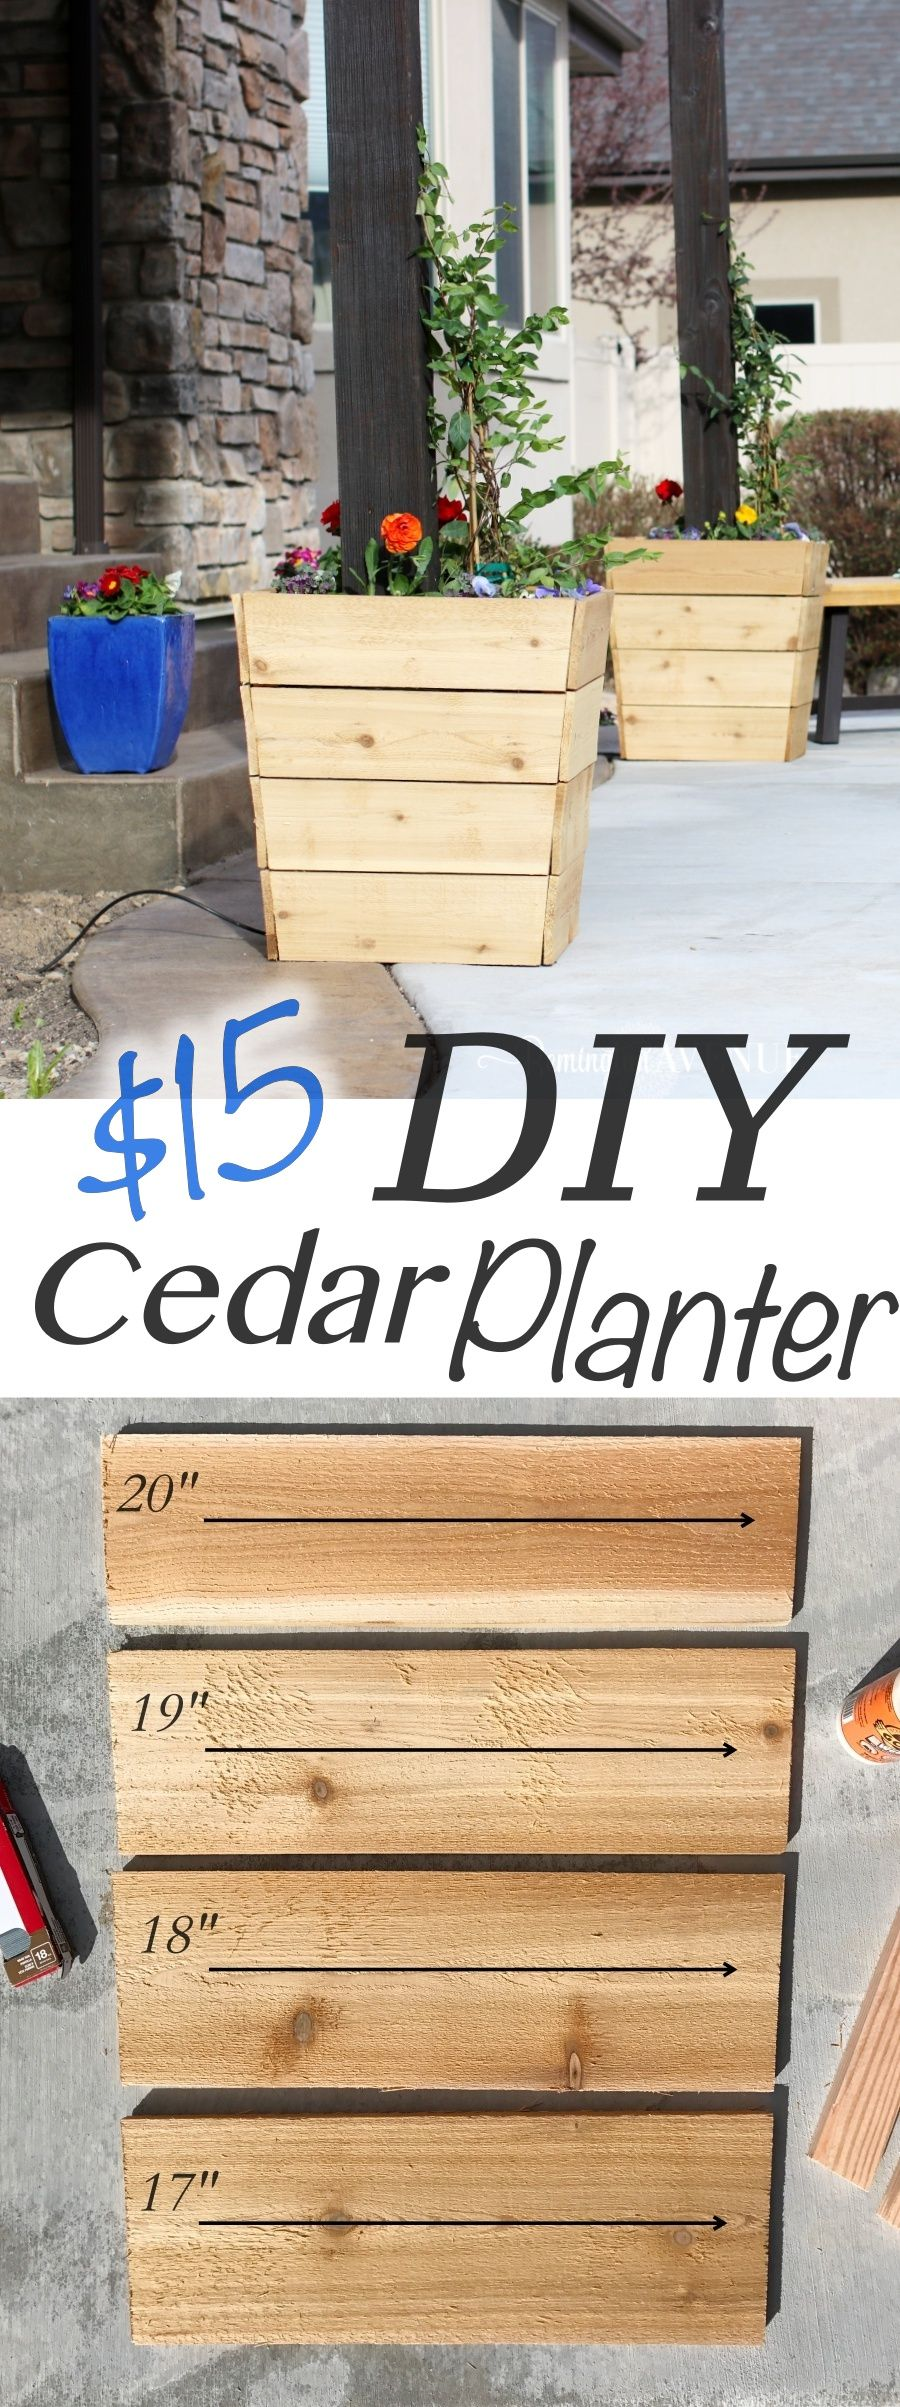 15 Modern Cedar Planter Diy Planters Outdoor Diy Wood 640 x 480